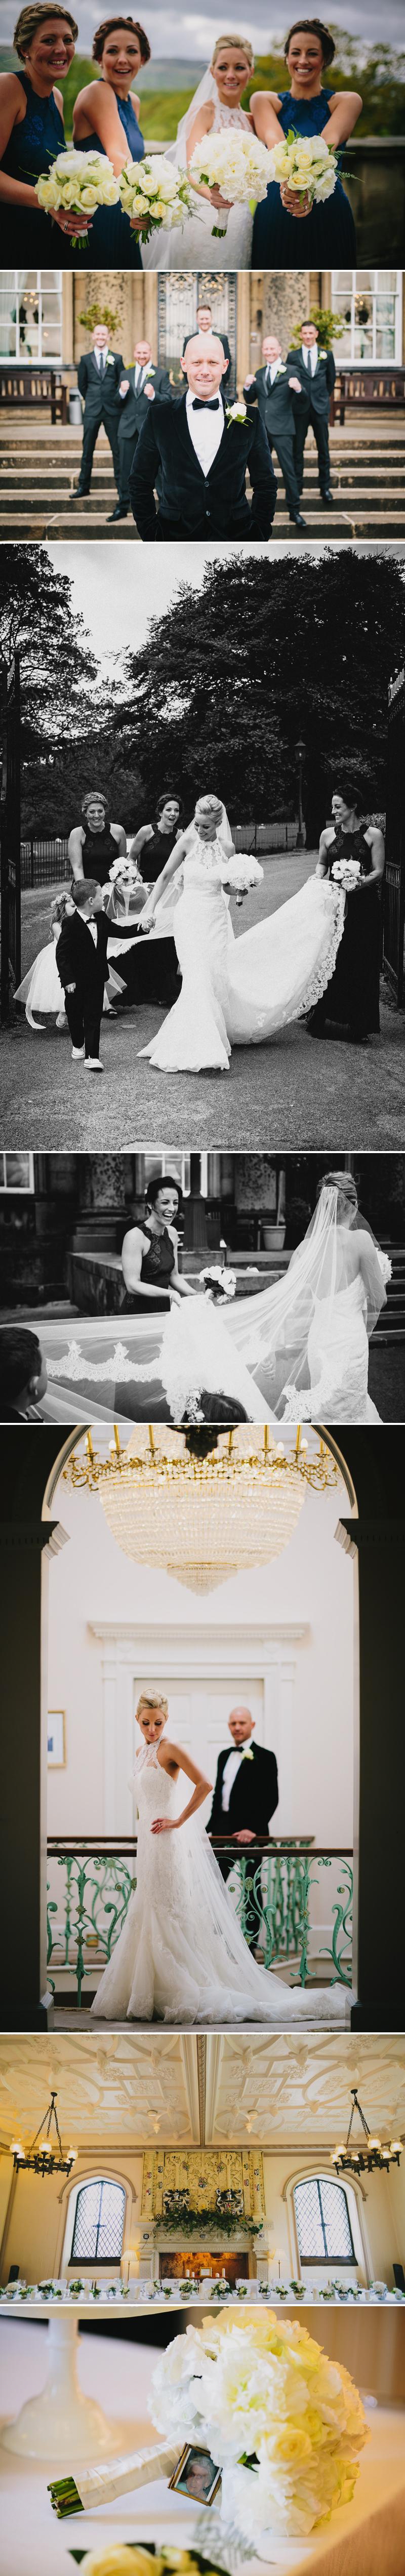 wedding-venues-in-yorkshire-denton-hall-wedding-photography-003